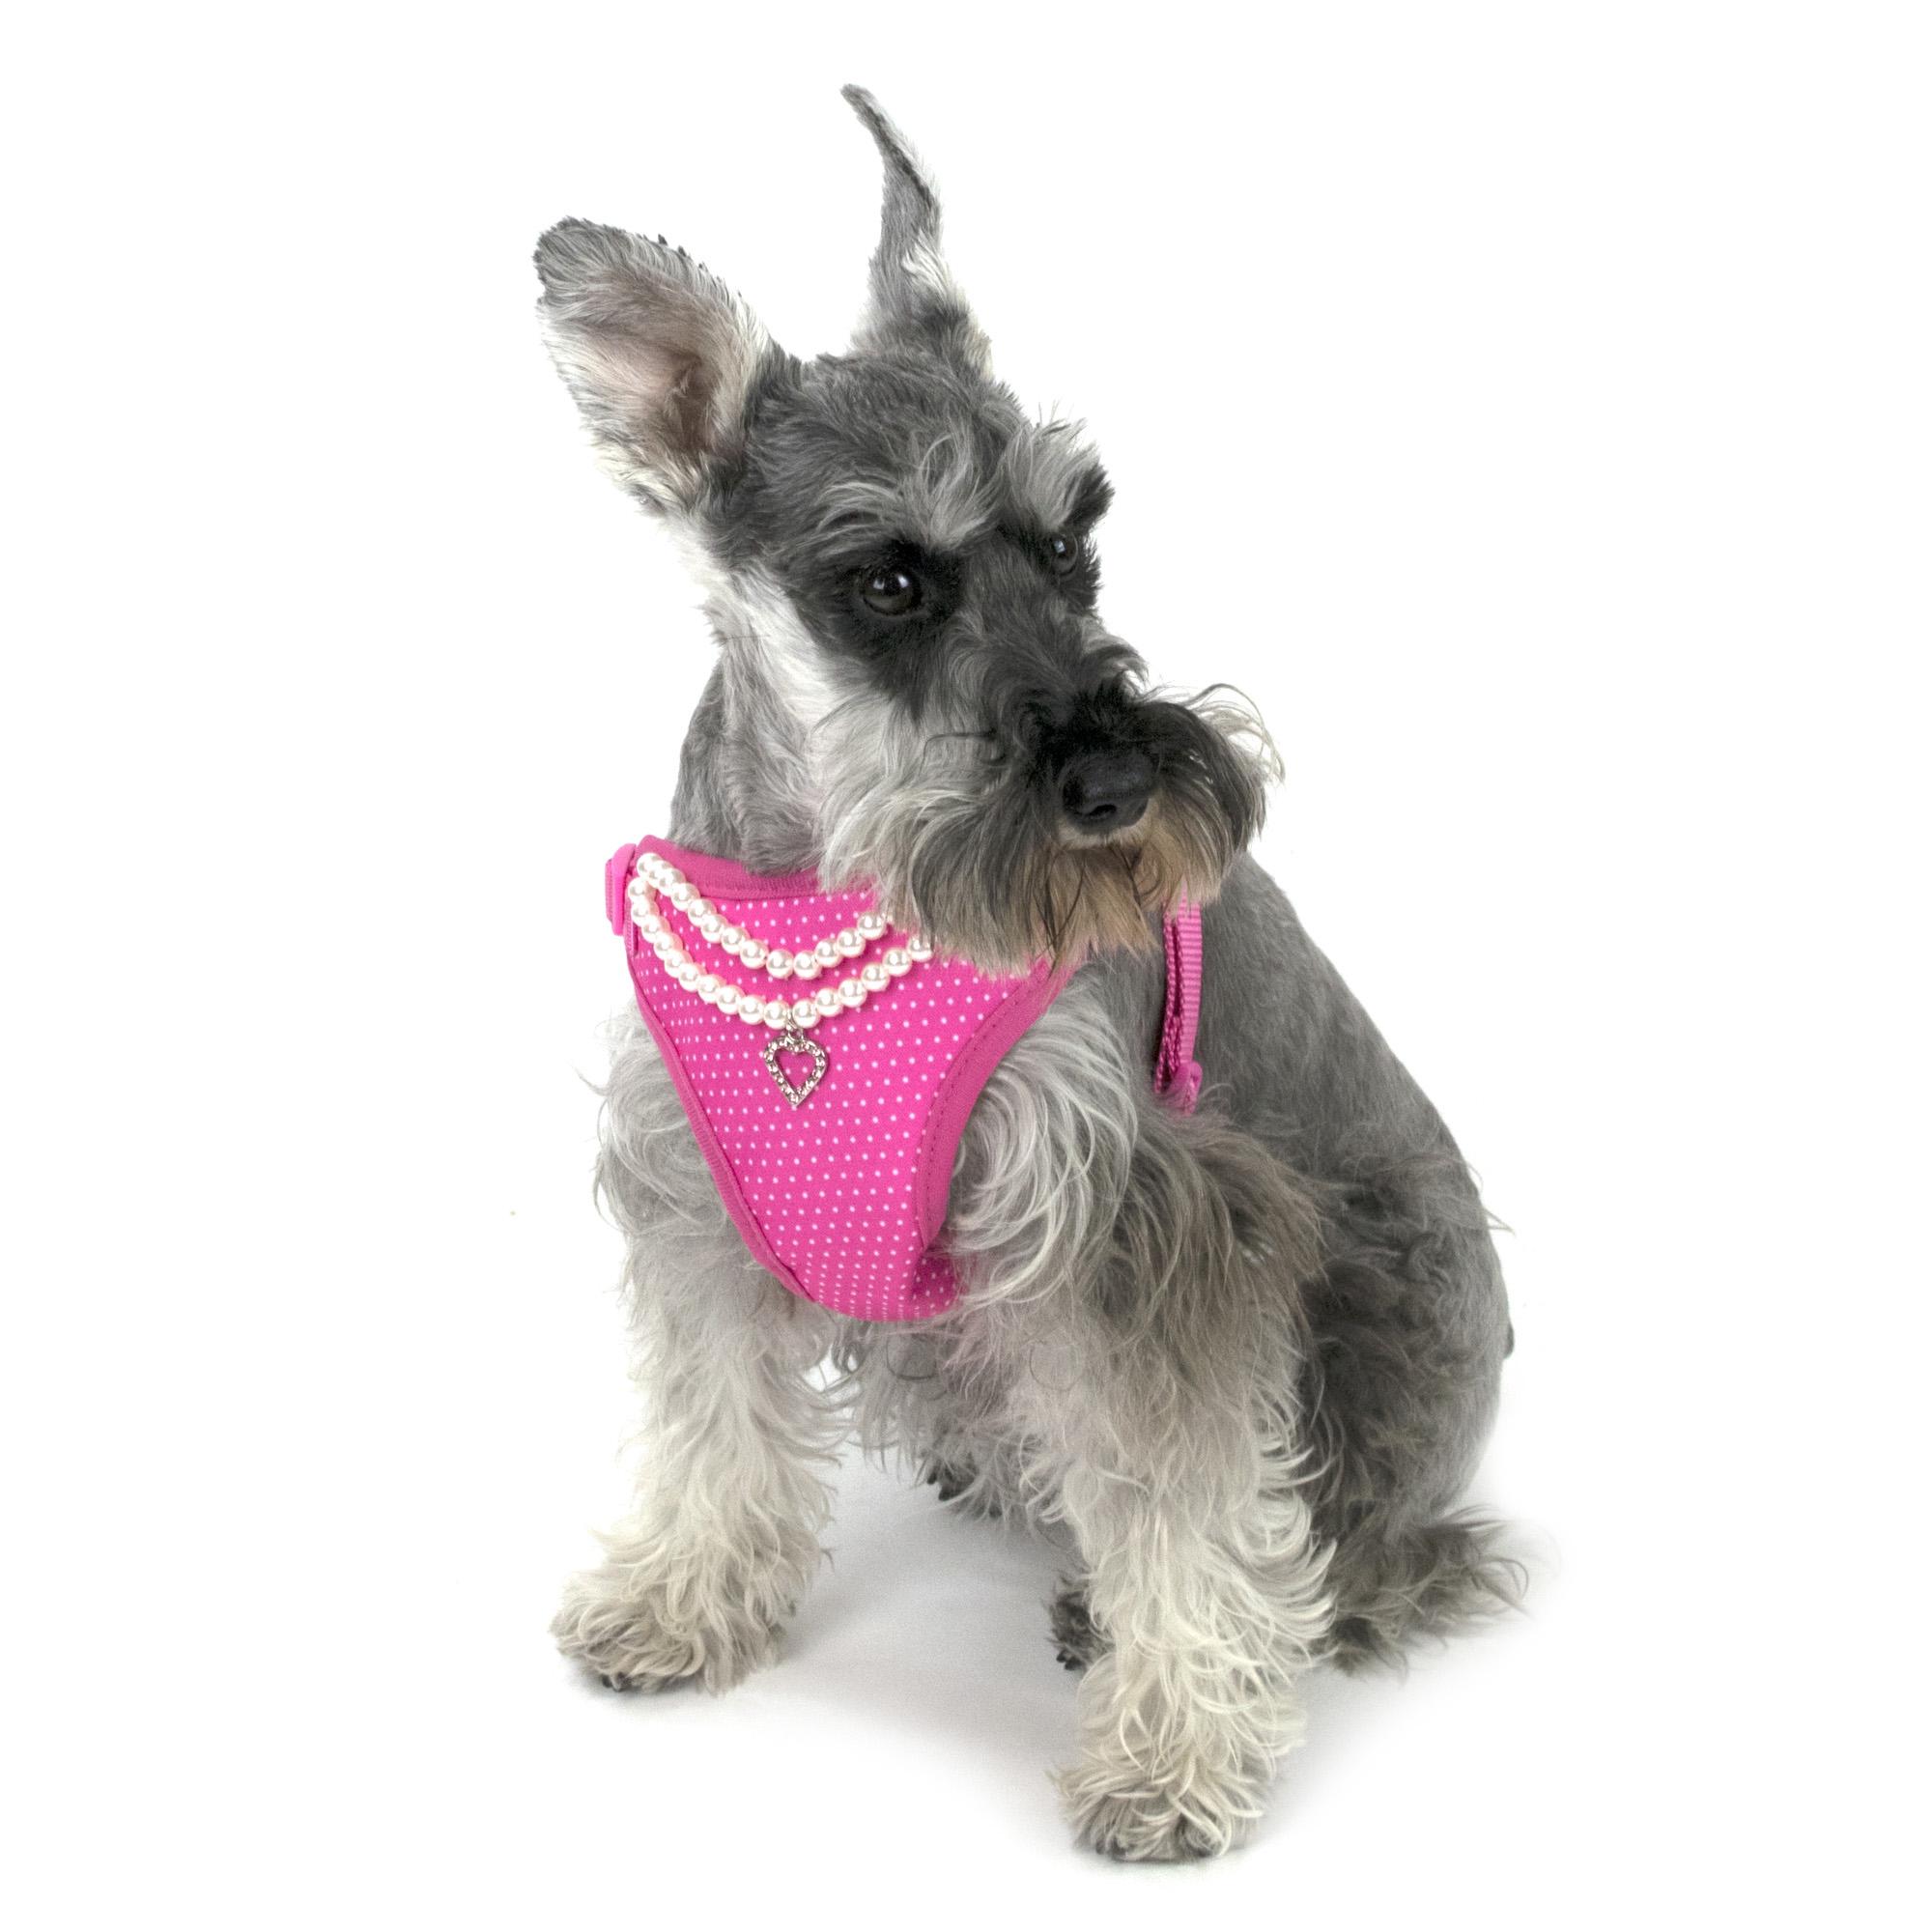 Custom Dog Harness Mojito Green Polka Dot Print Dog Harness Dog Harness Puppy Harness Strap Dog Harness Polka Dot Dog Harness